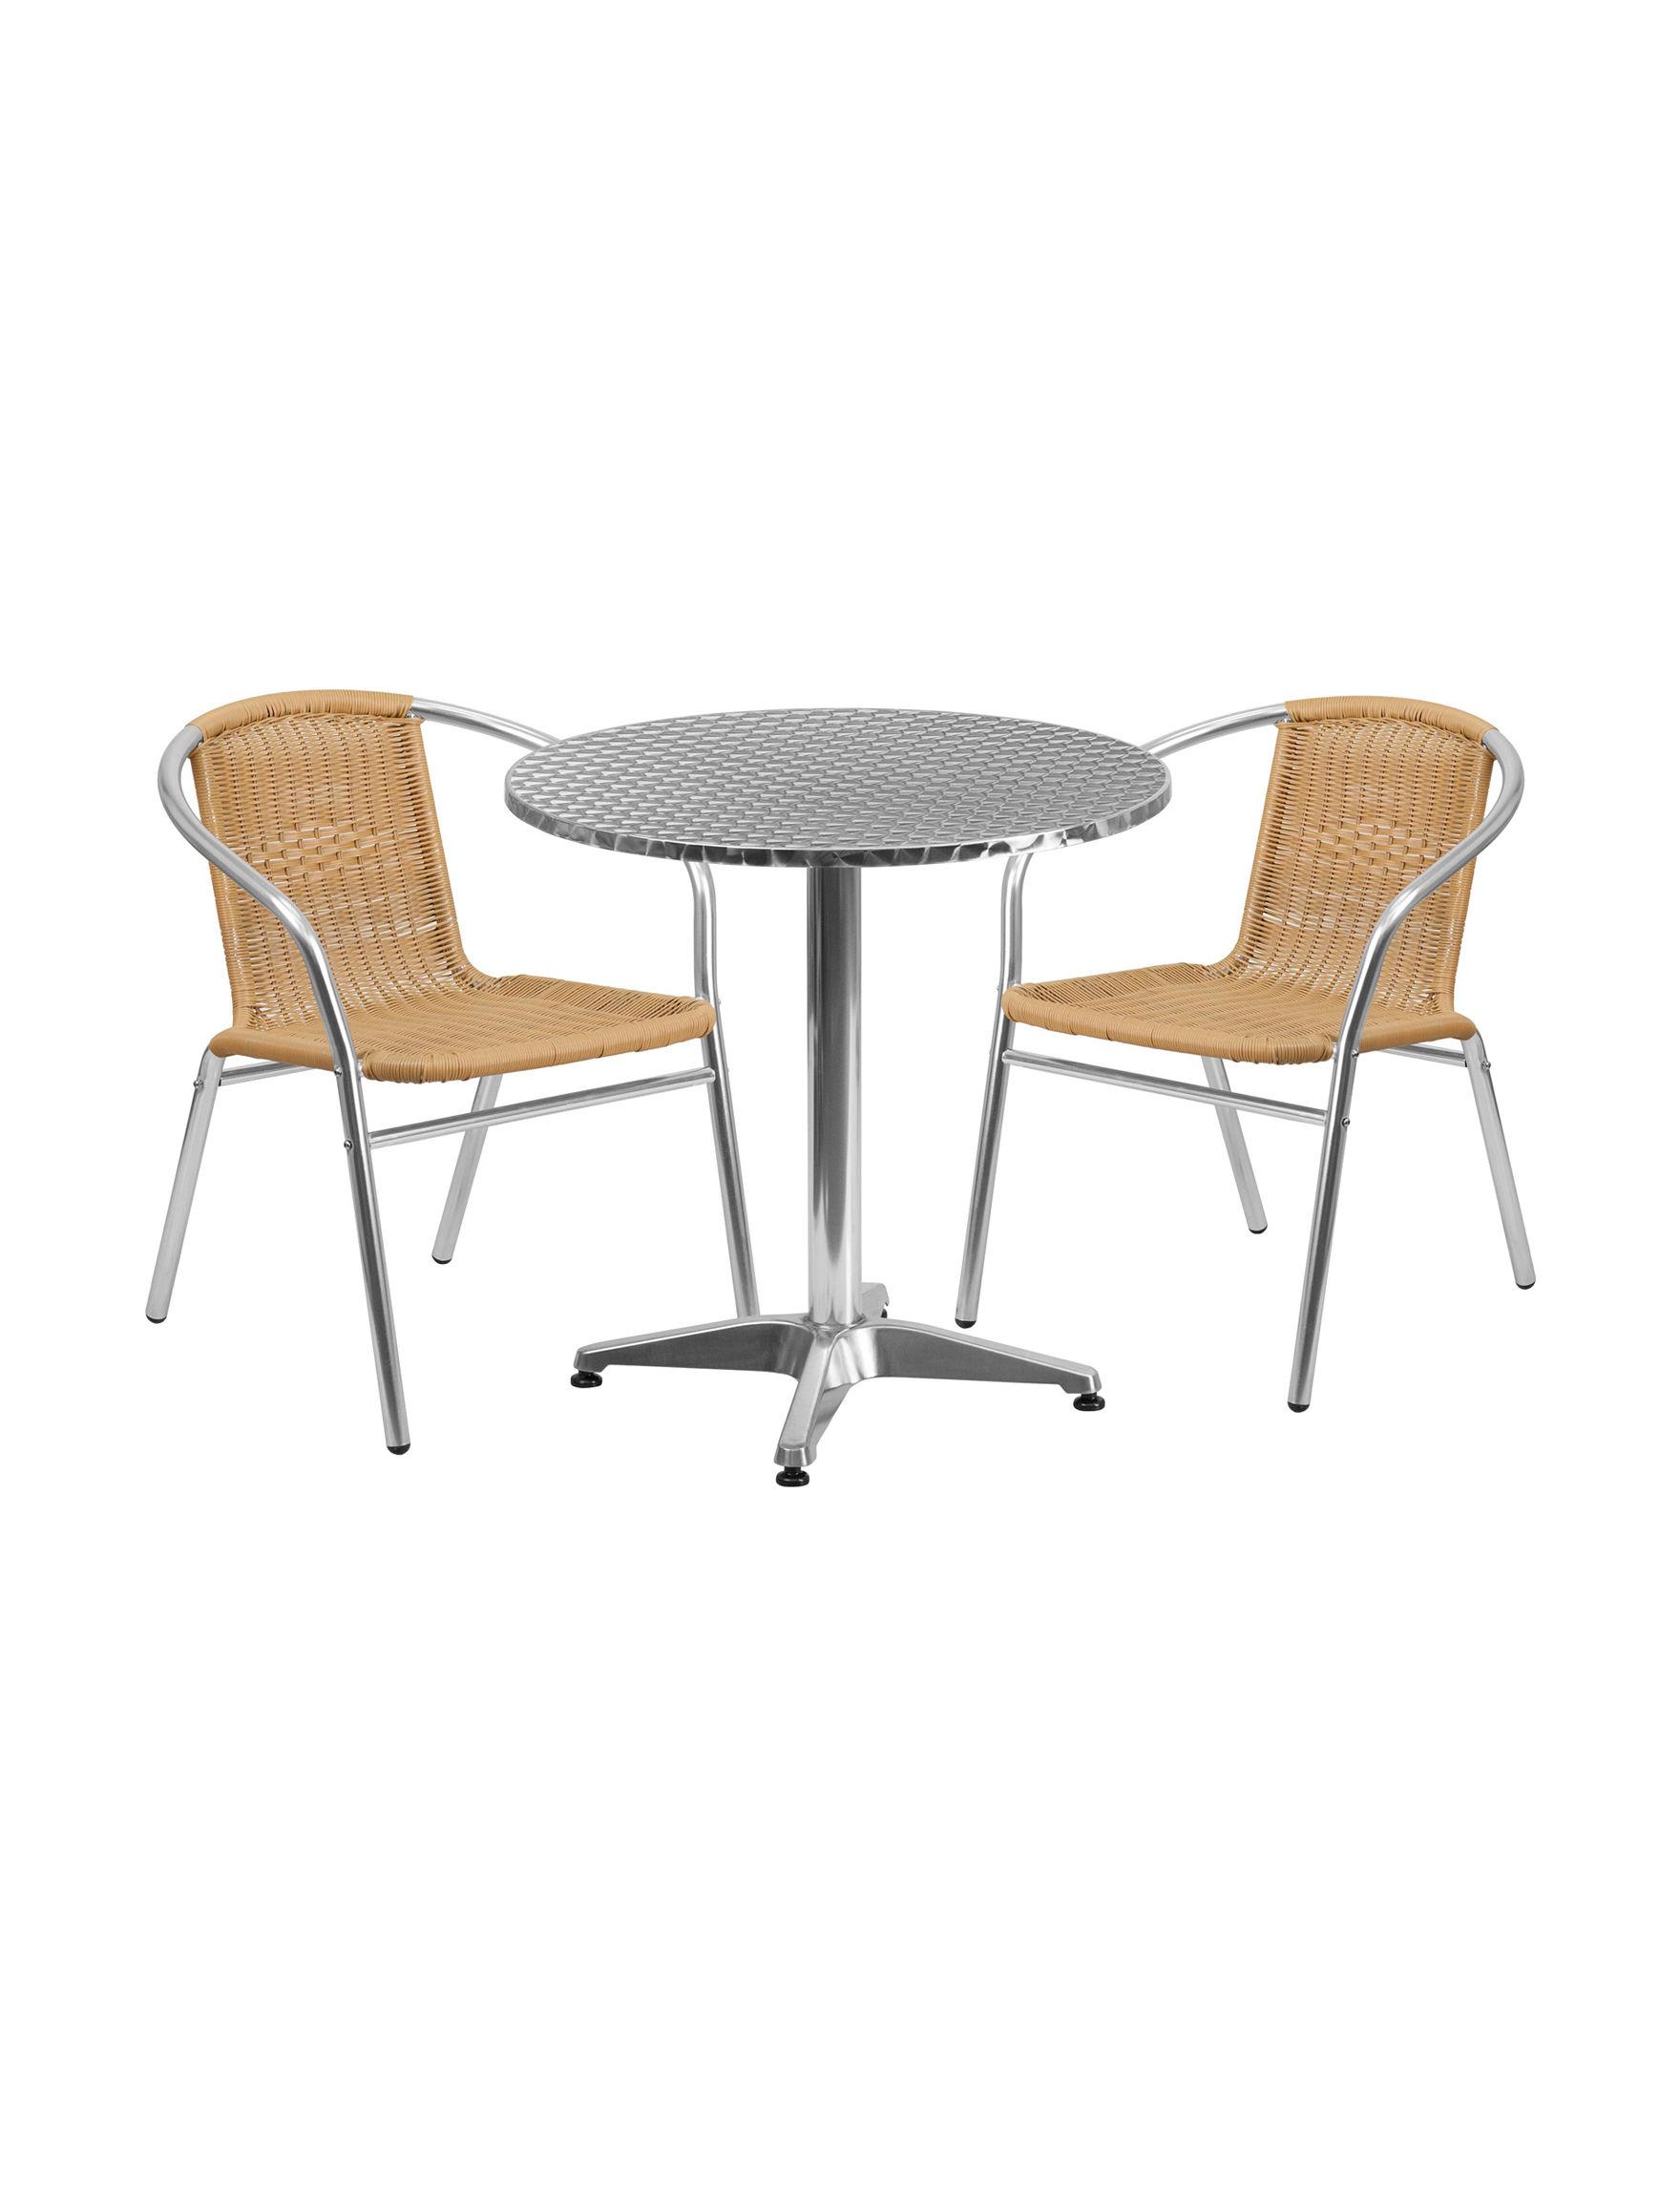 Flash Furniture Beige Kitchen & Dining Furniture Patio & Outdoor Furniture